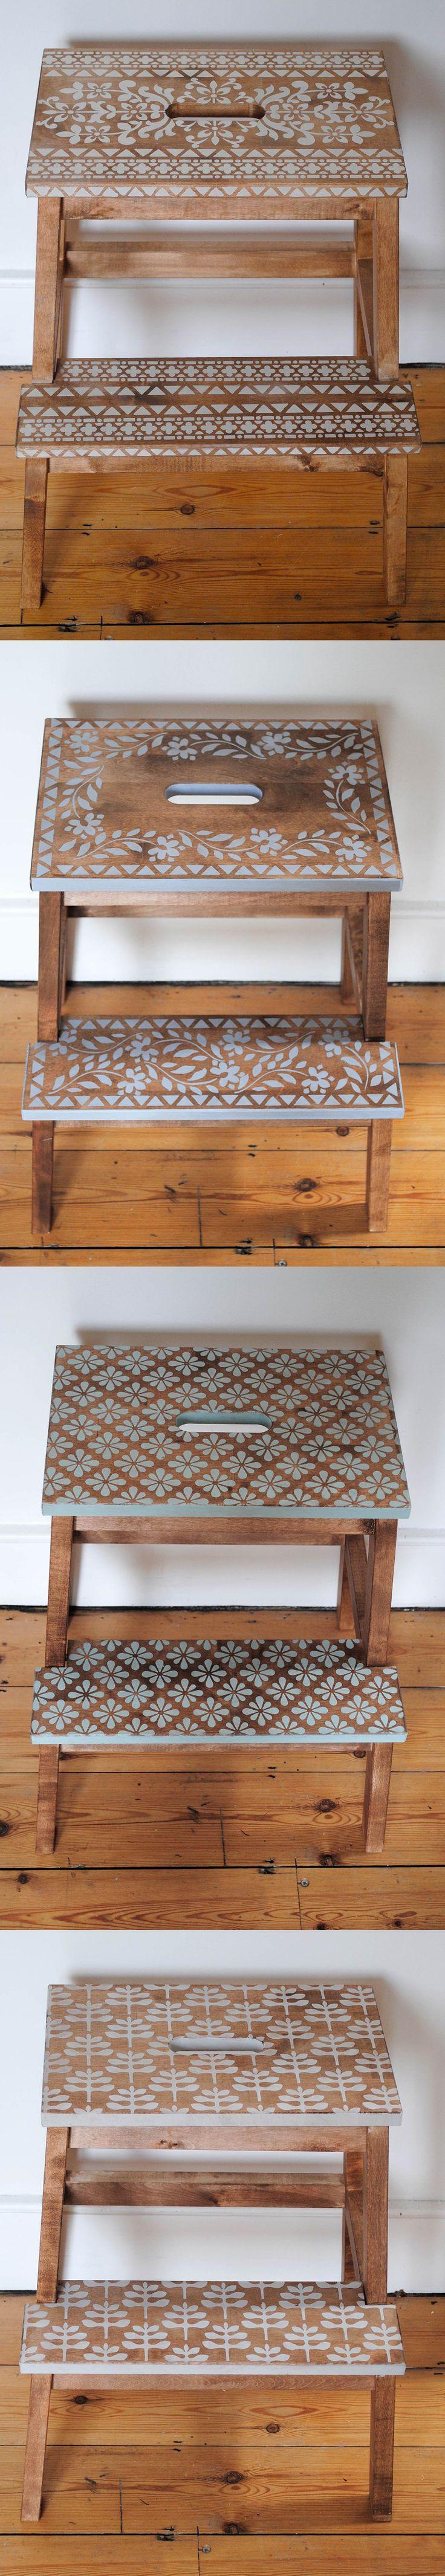 Best 25 Folding stool ideas only on Pinterest